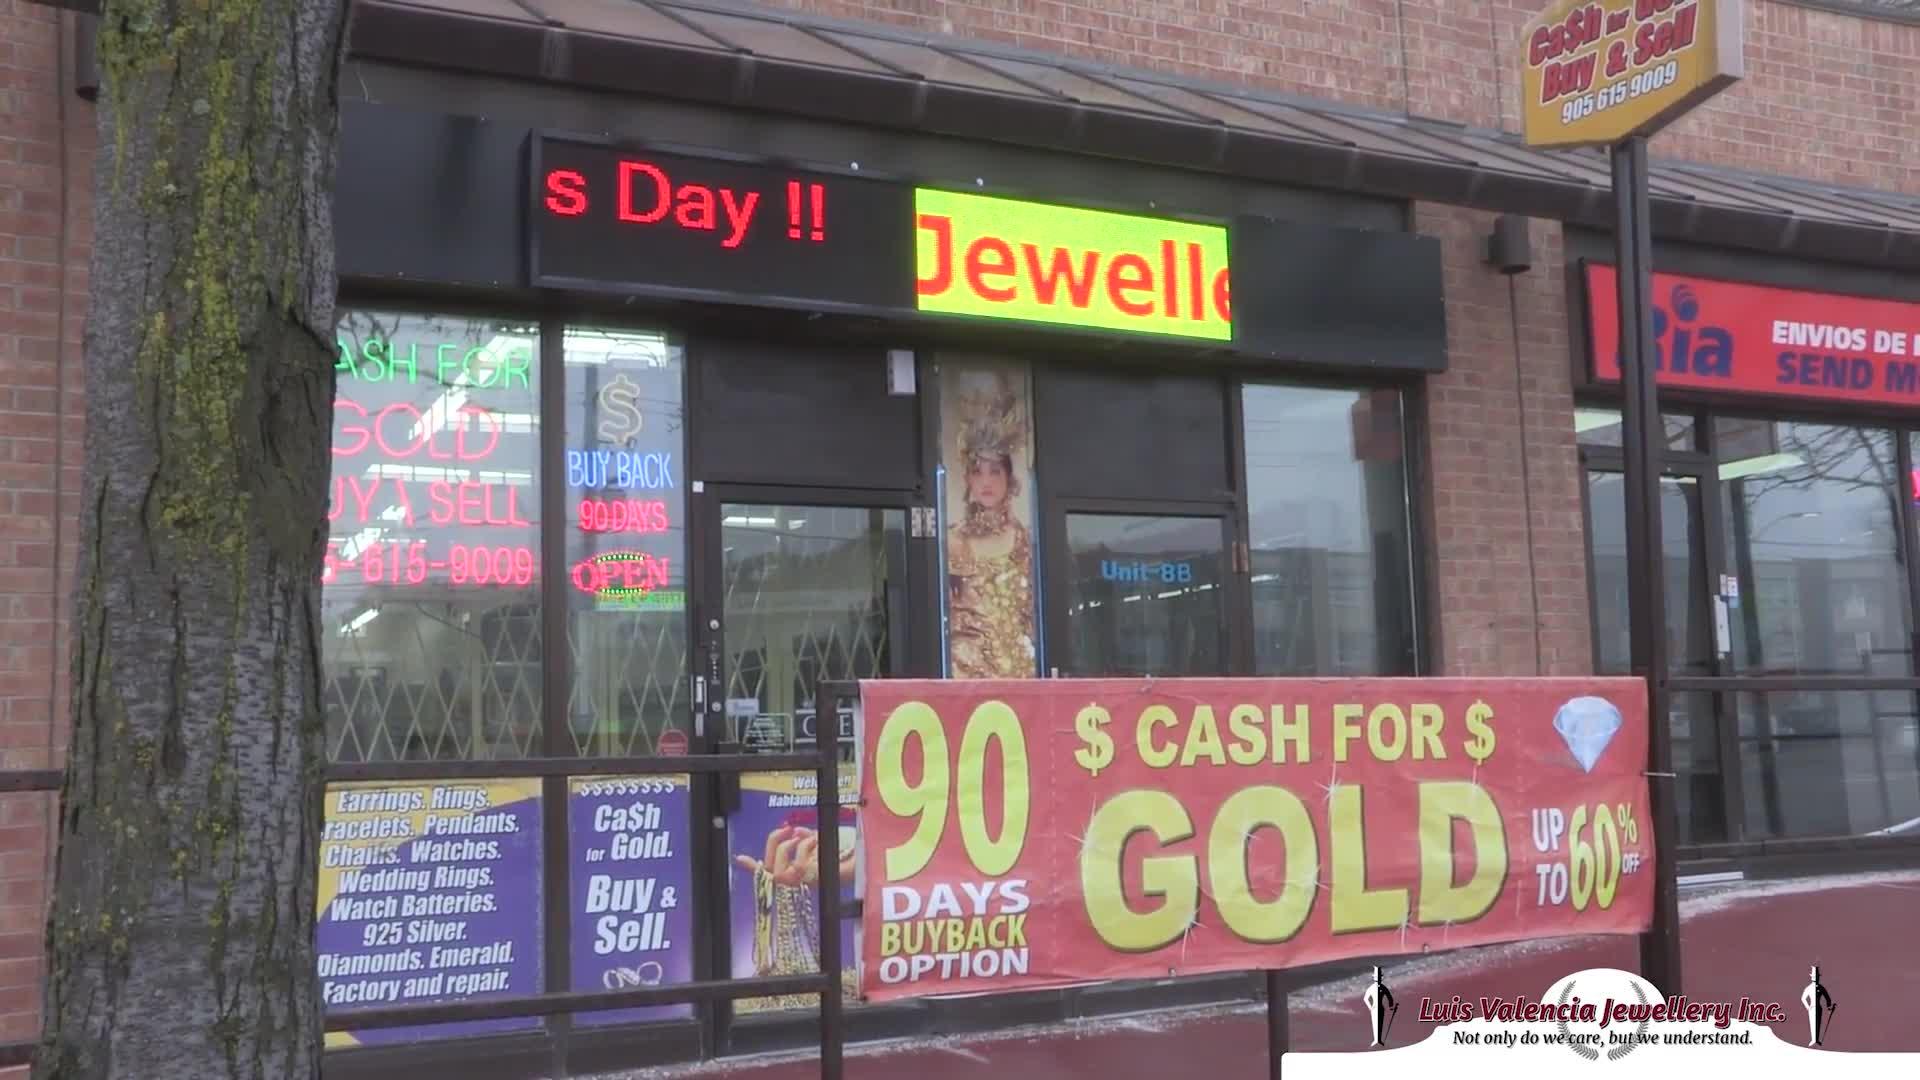 Valencia Jewellery Inc - Jewellery Buyers - 905-615-9009